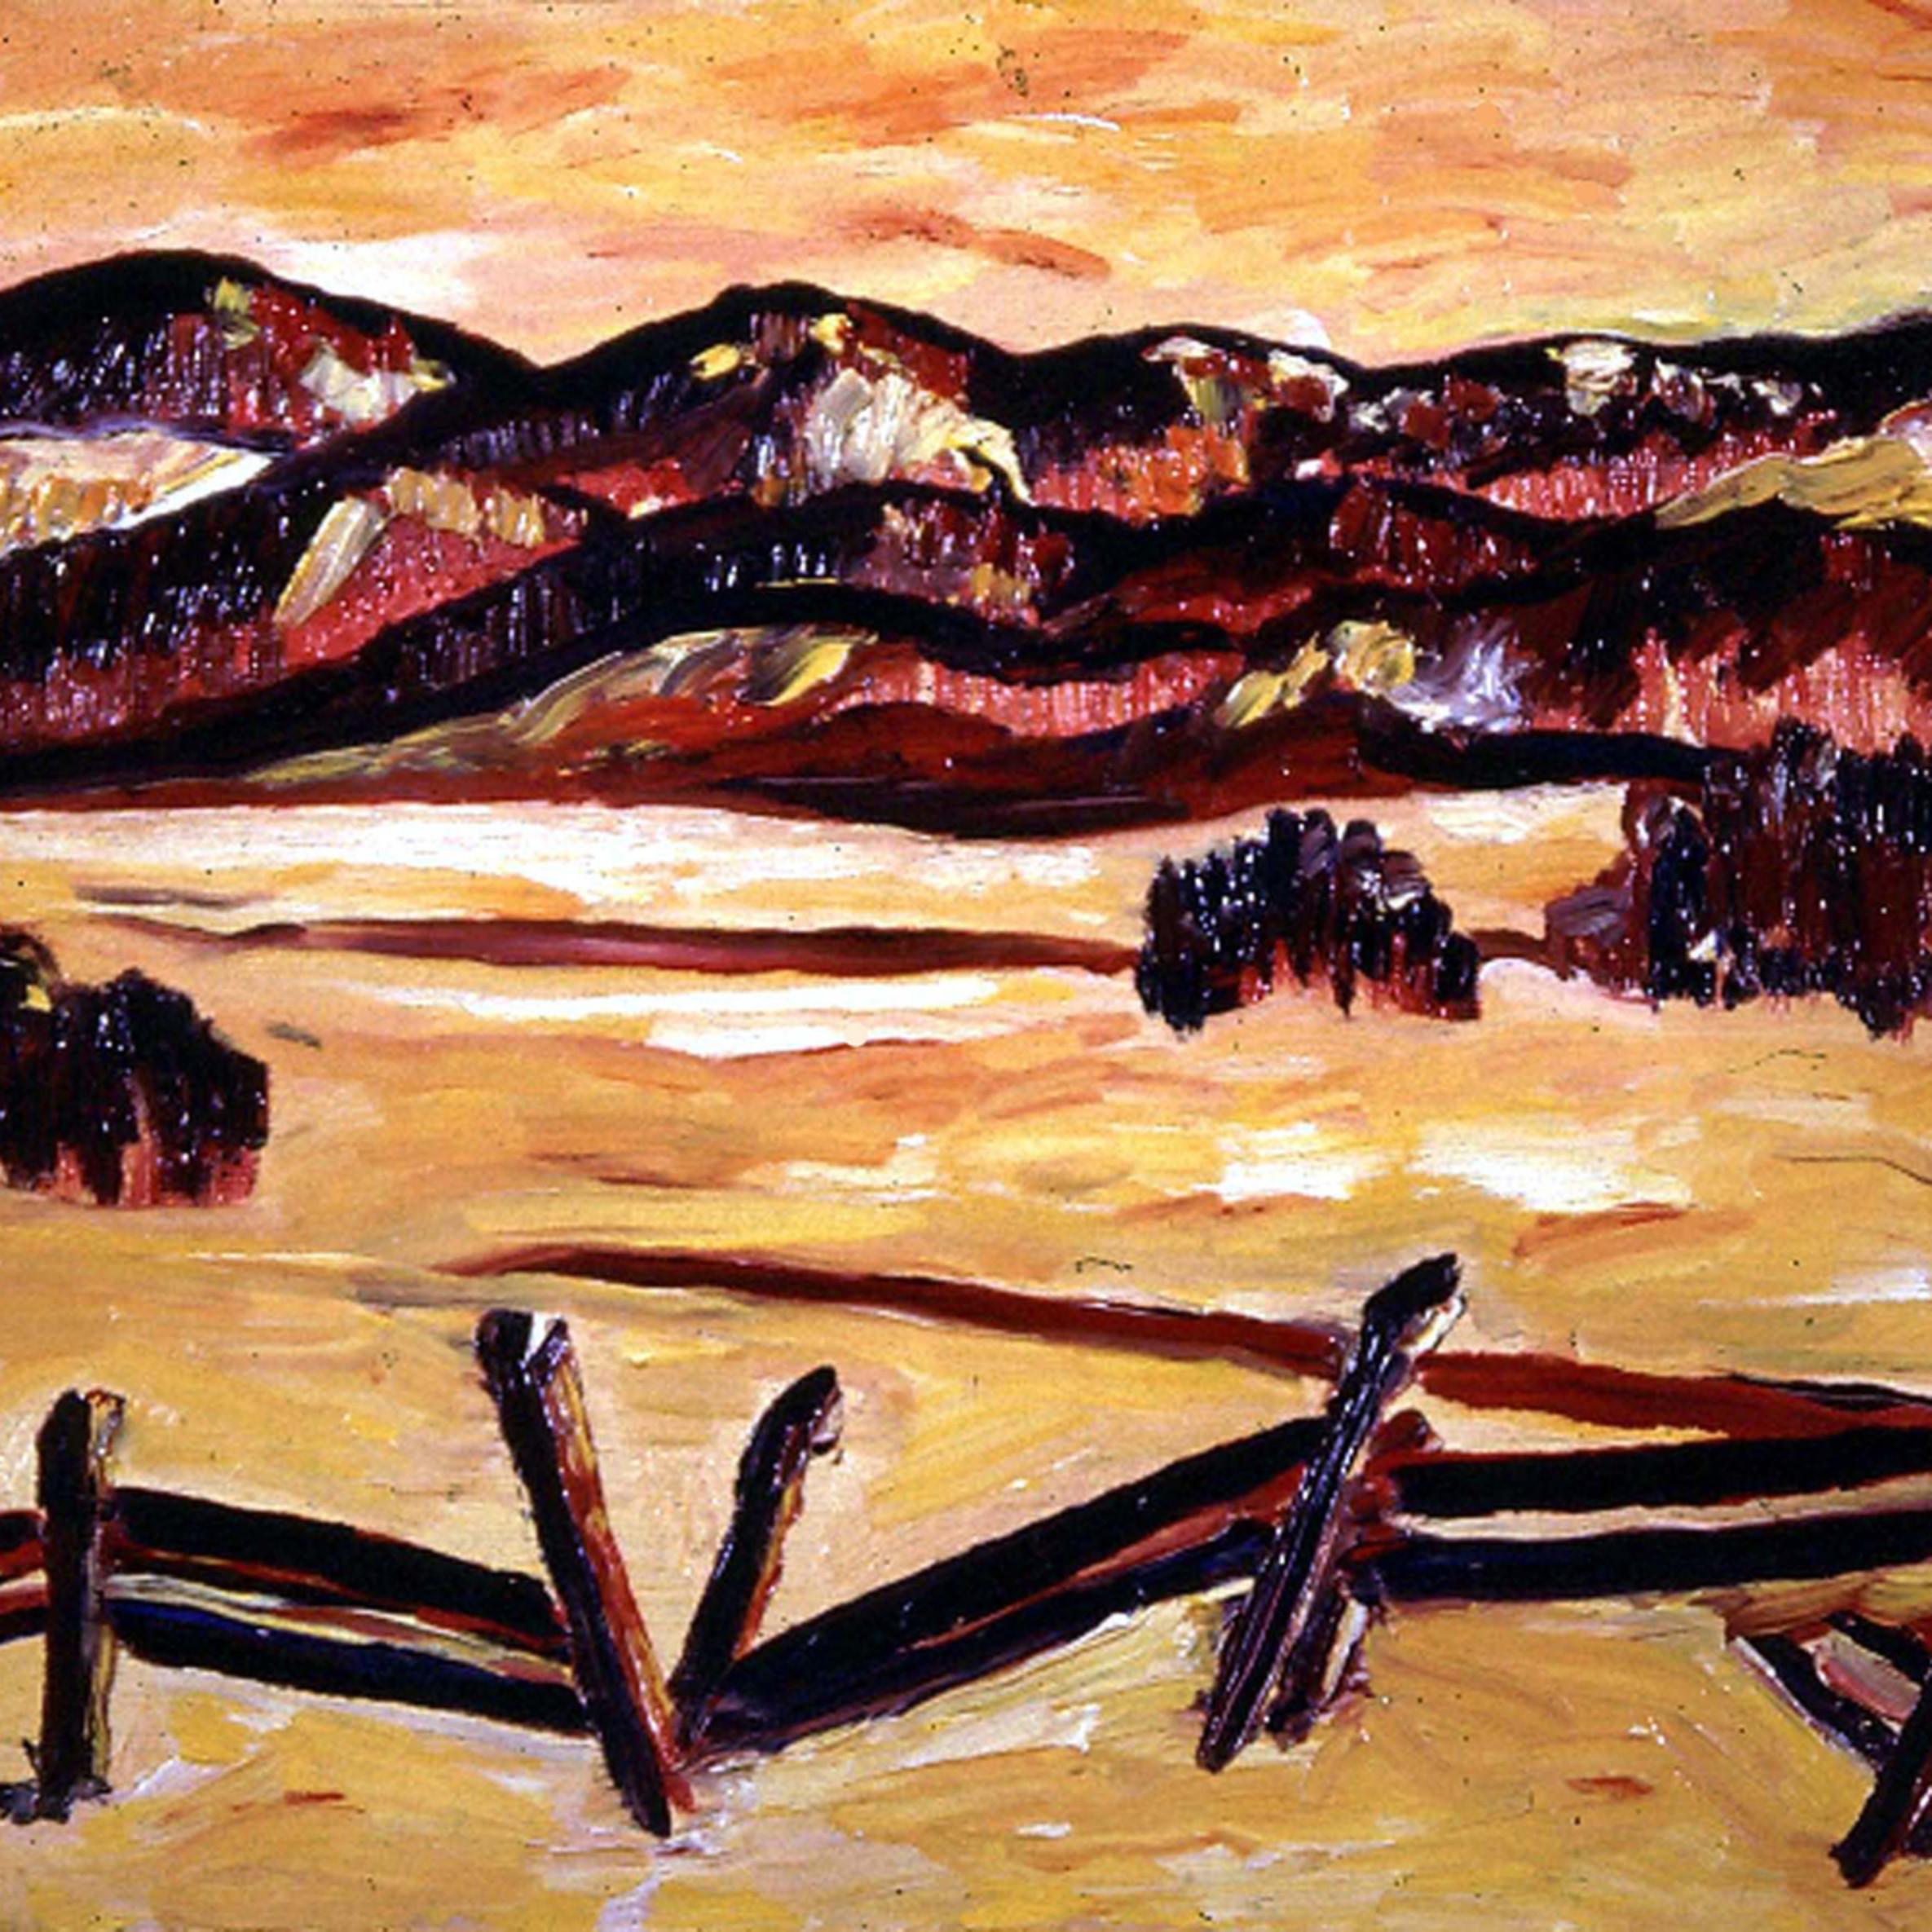 Snow   oil on canvas   8 22 x 10 22 gv9adp